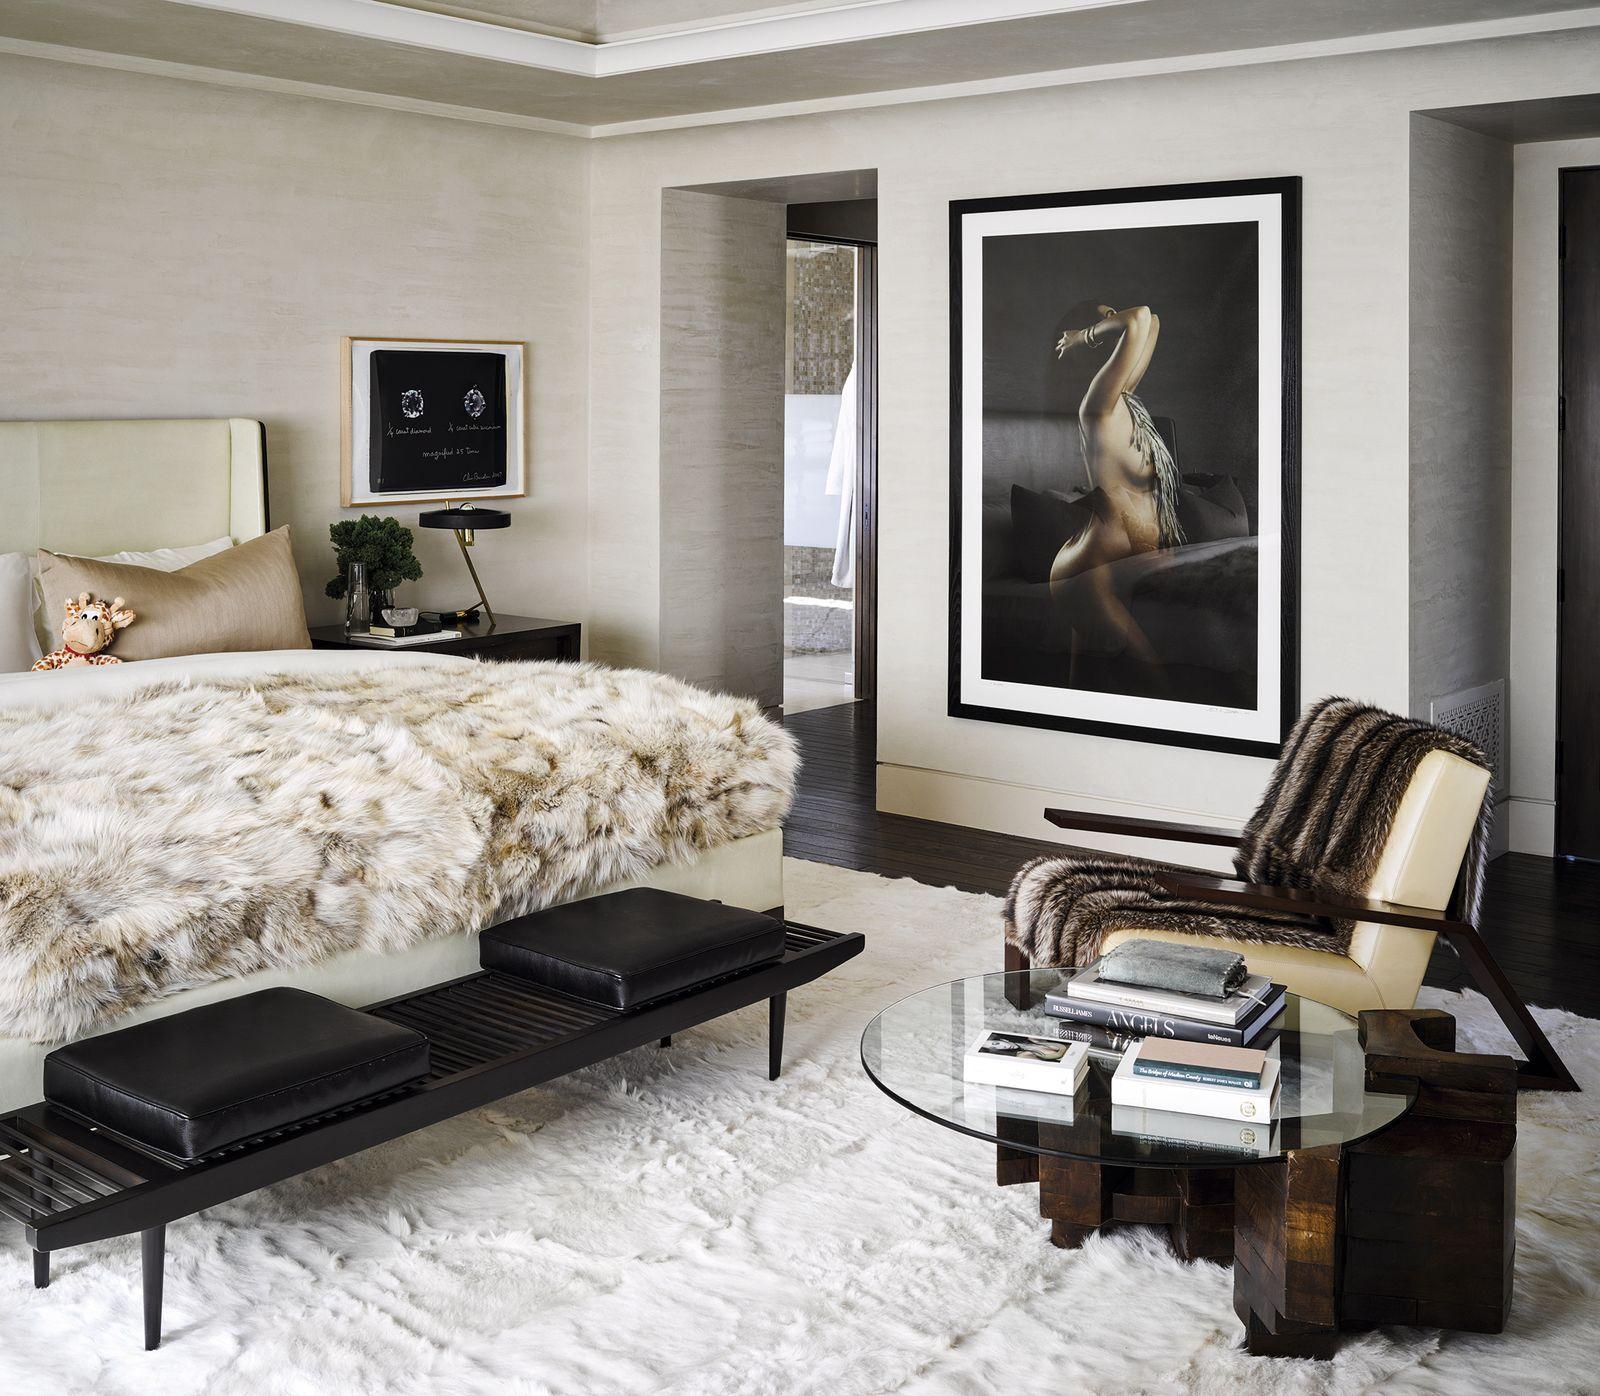 La Casa De Kourtney Kardashian En California Luxury Home Furniture Bedroom Design Home Decor Bedroom Kourtney kardashian bedroom pictures